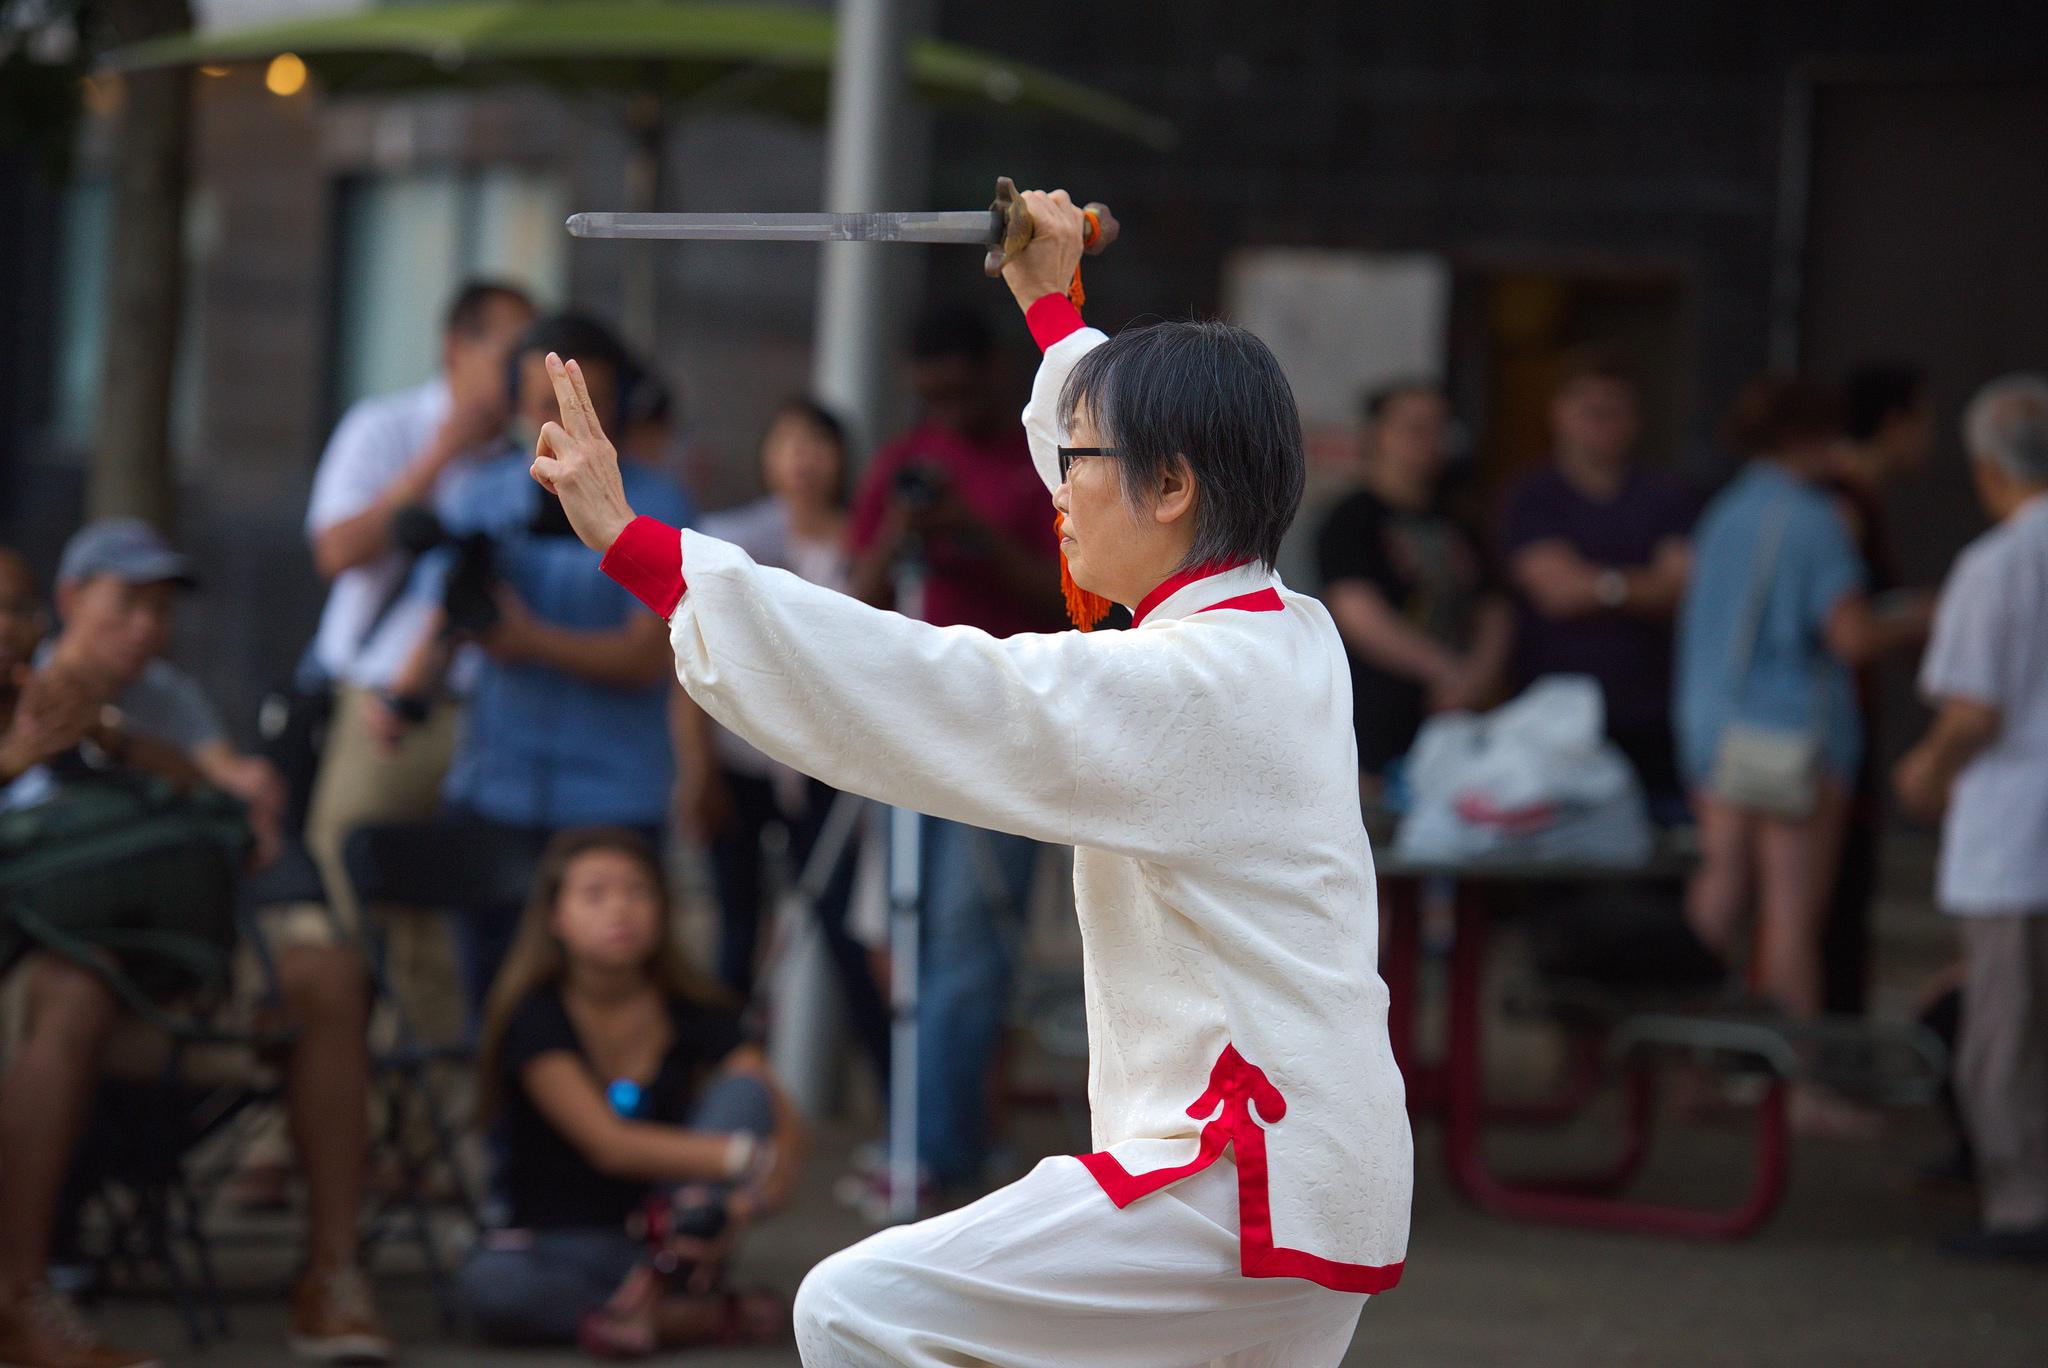 Martial Arts_Bow Sim Mark7.jpg